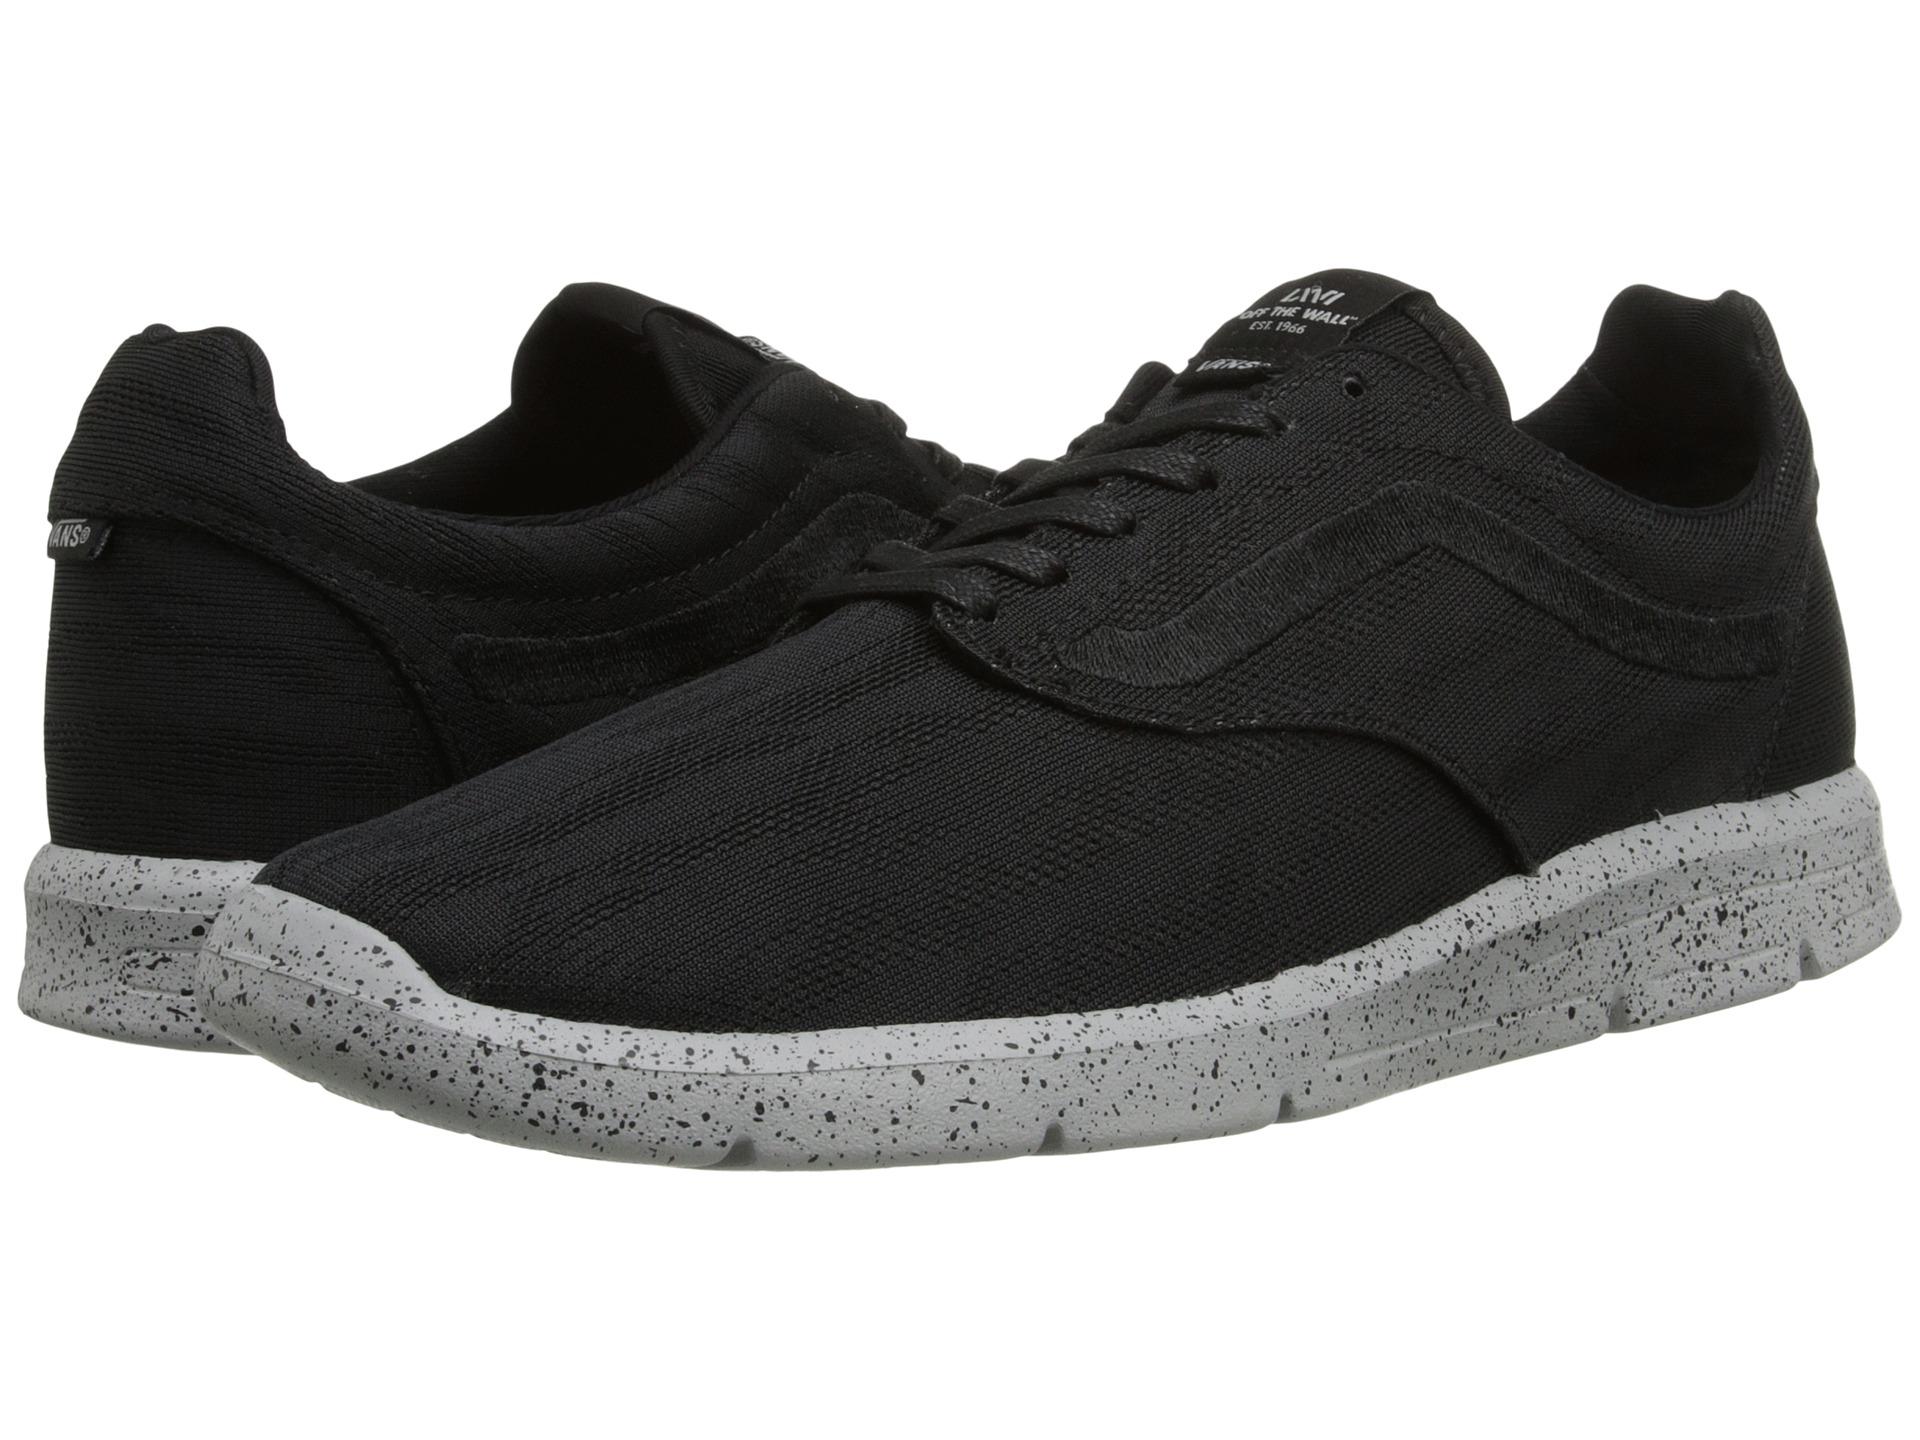 vans iso 1.5 shoes - (tiger mesh) black/high rise